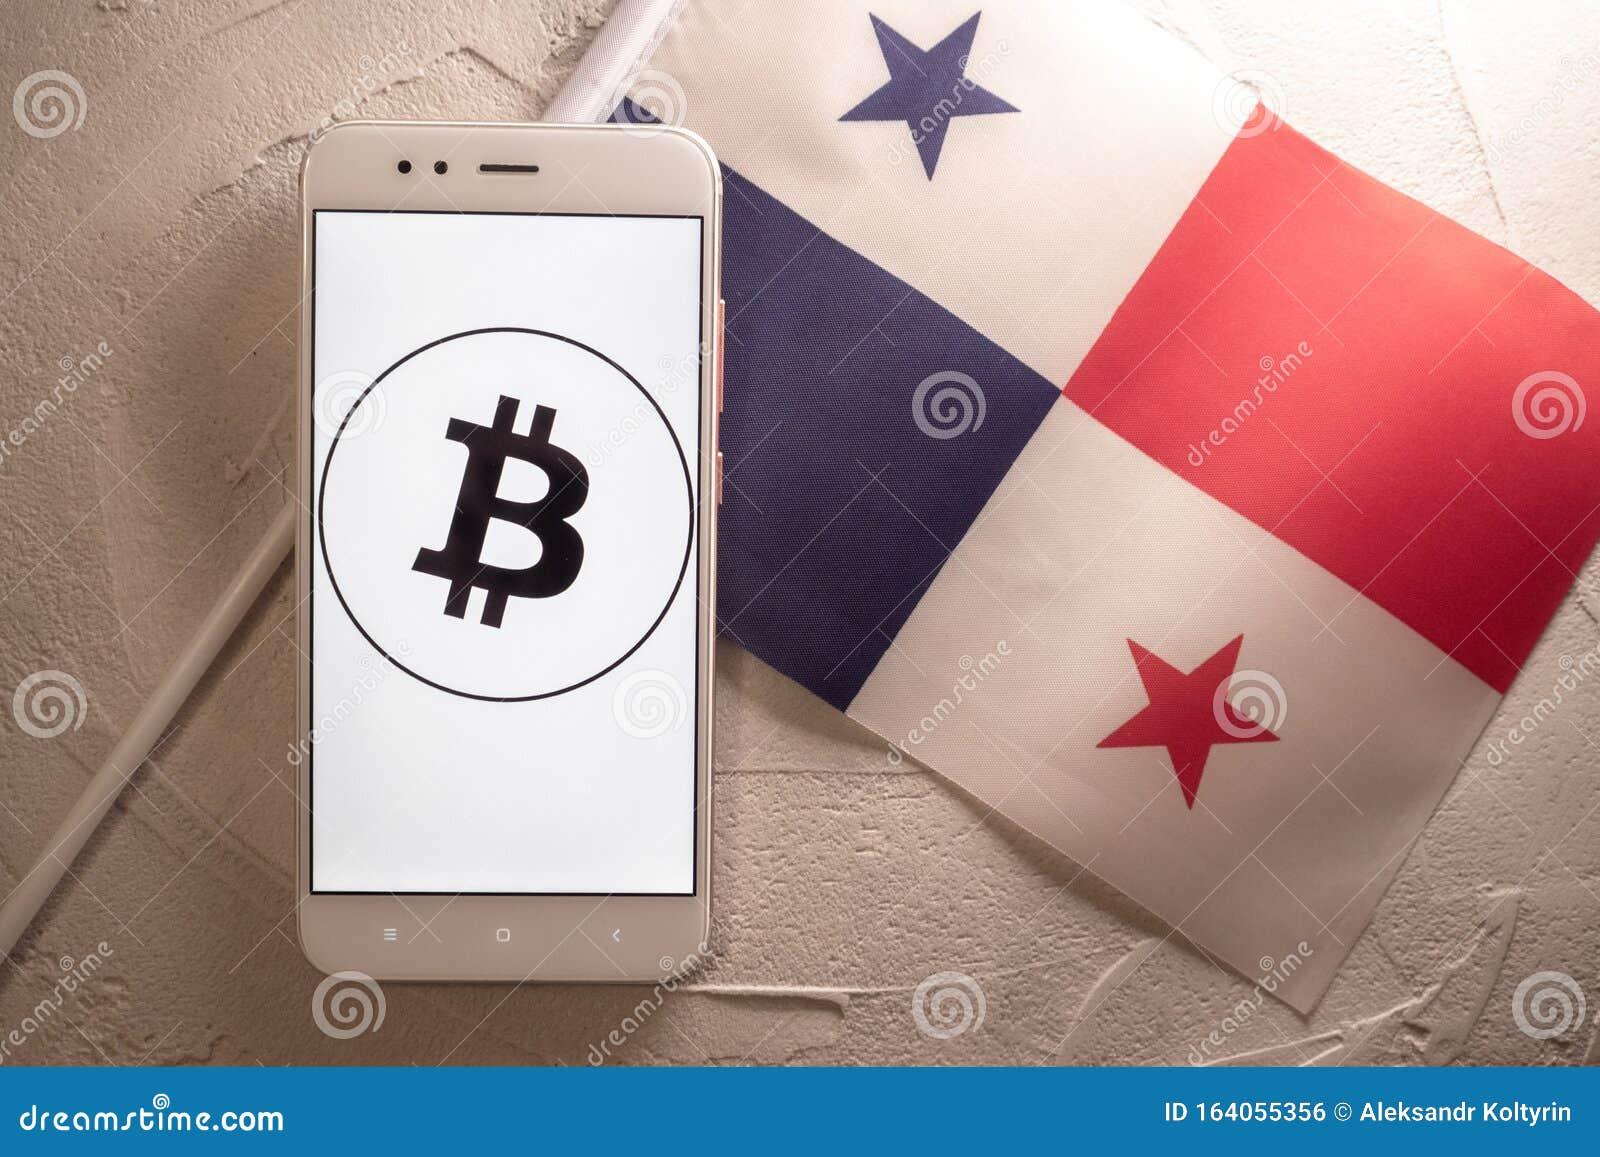 panama cryptocurrency regulation